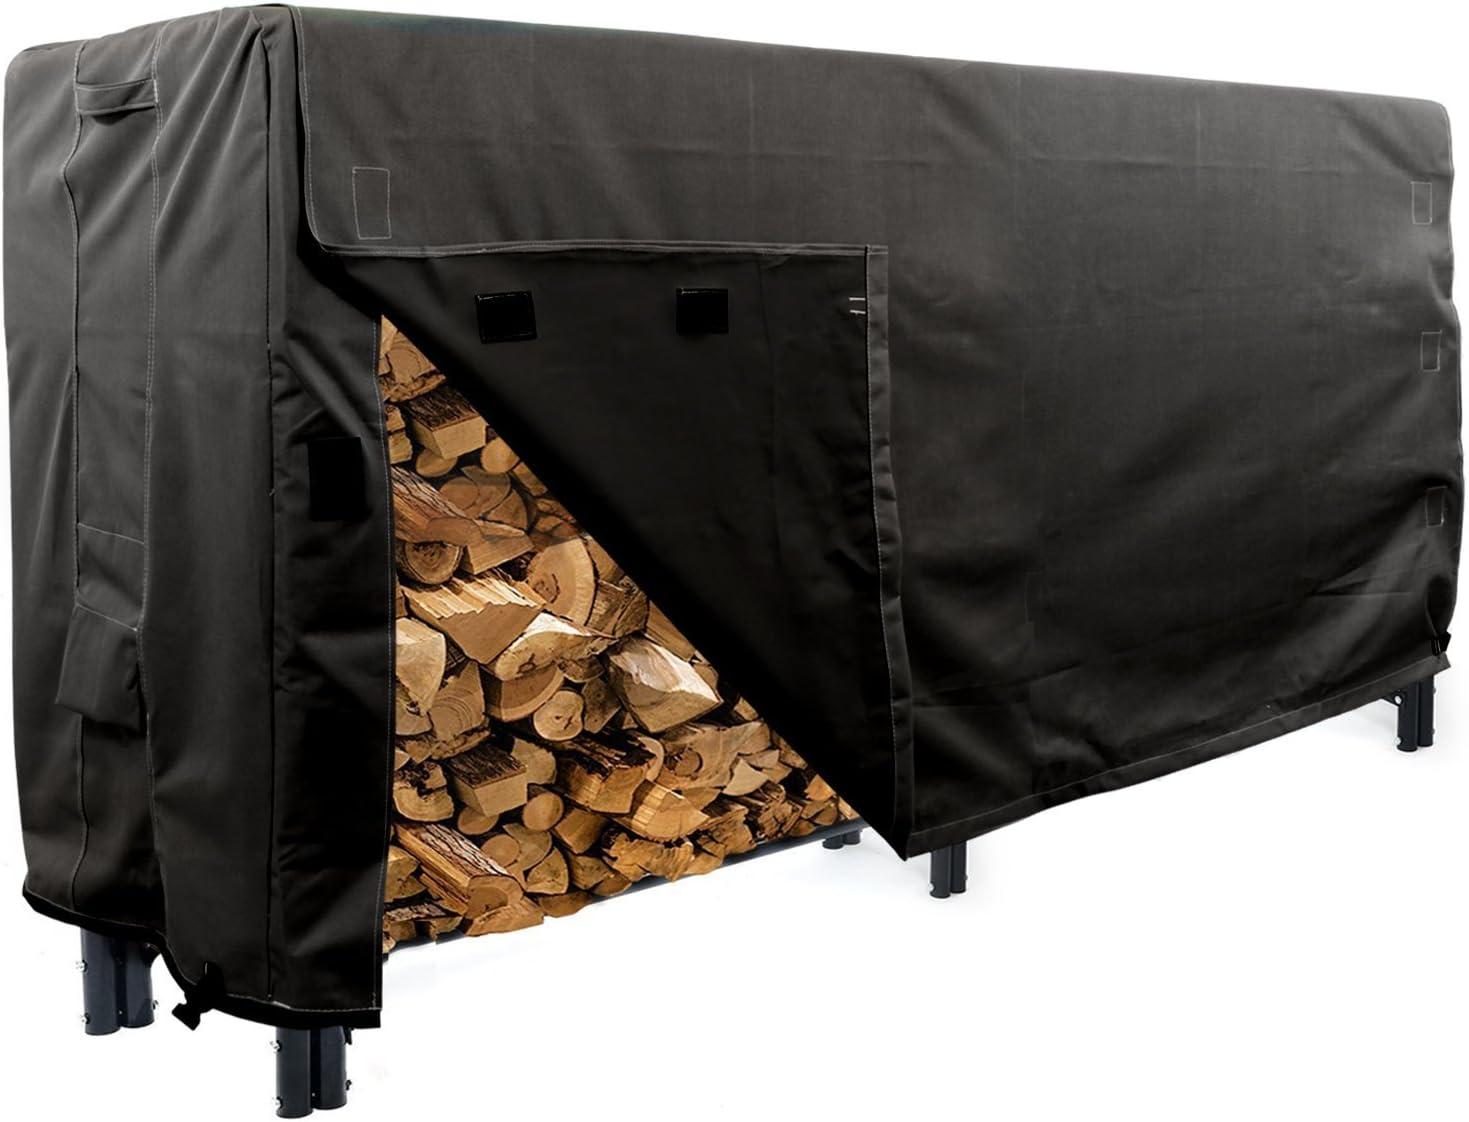 KHOMO GEAR - Heavy Duty Log Rack Cover - 8' - Panther Series - Black